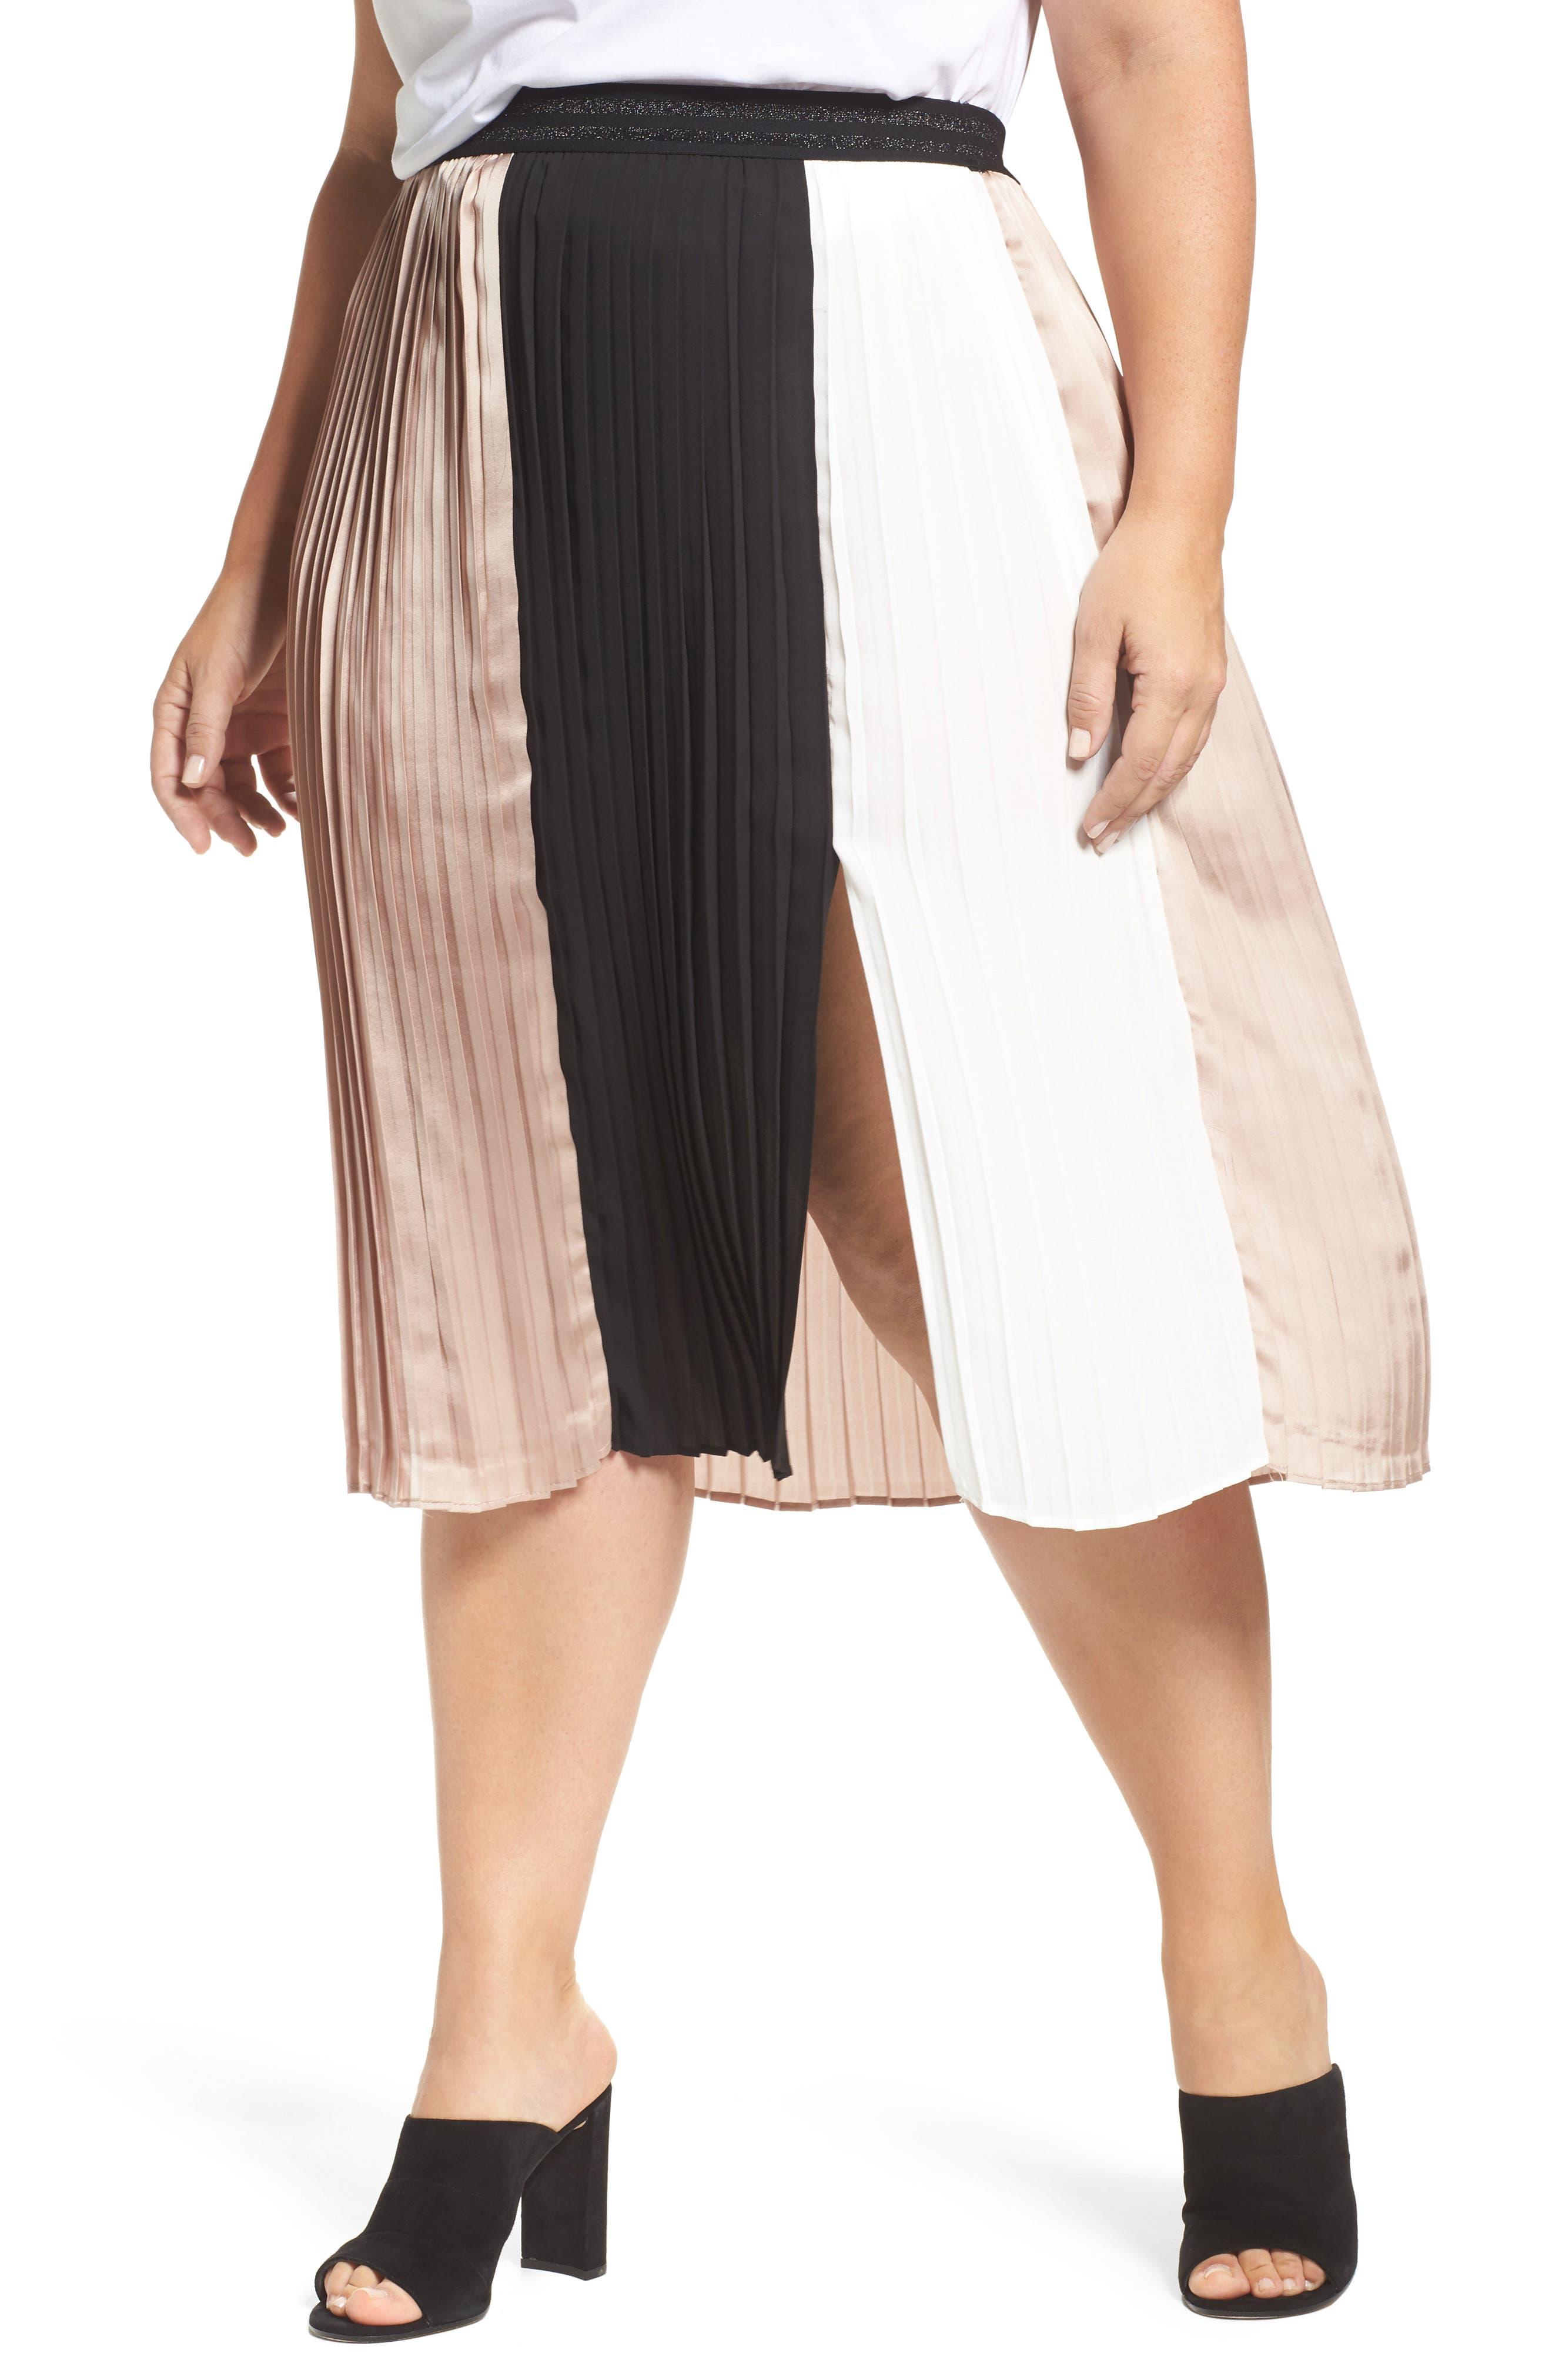 Alternate Image 1 Selected - ELVI Colorblock Pleat Skirt (Plus Size)